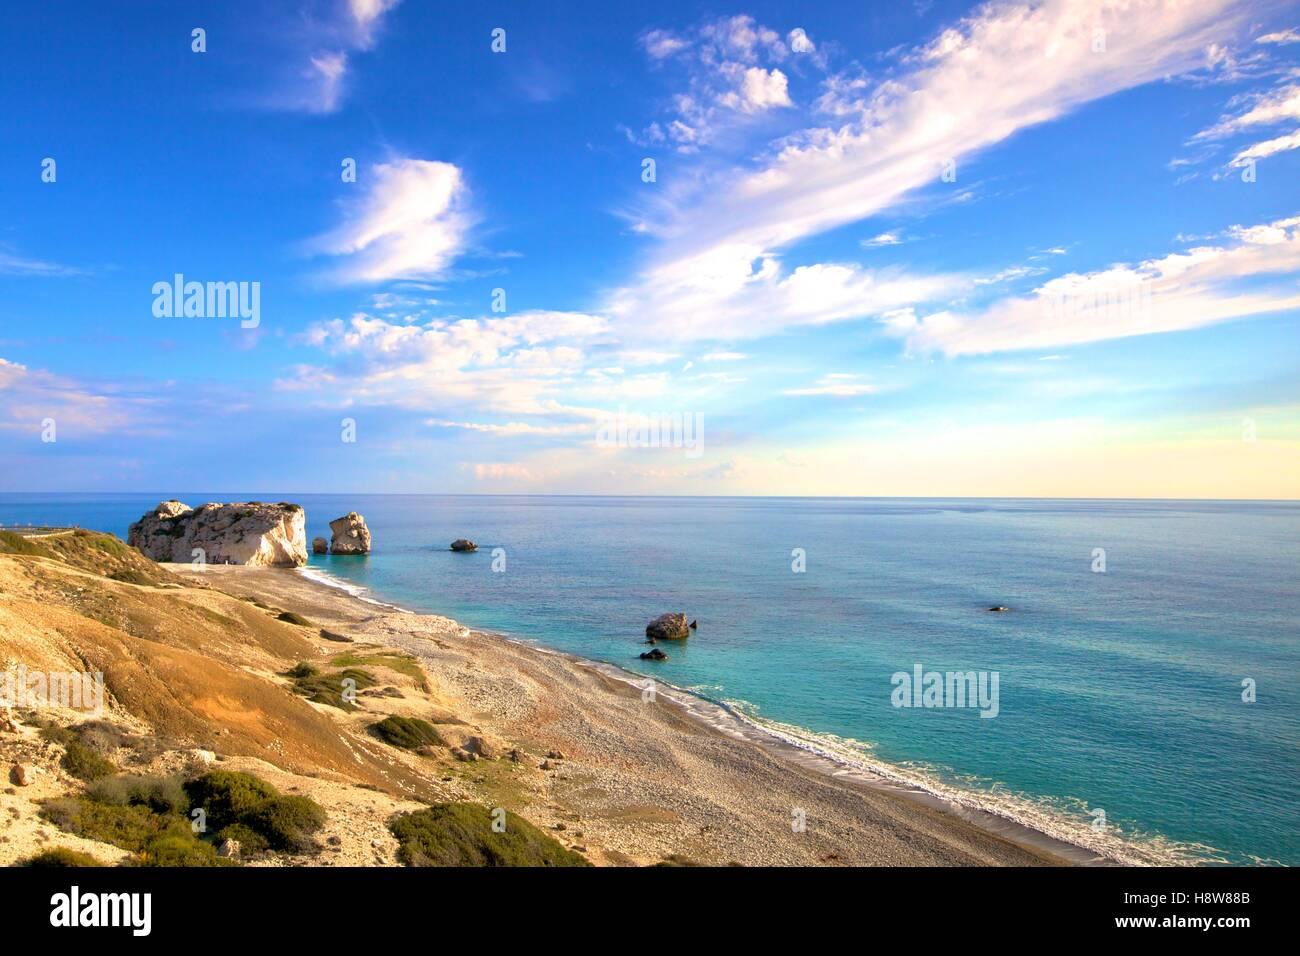 Aphrodite's Rock, Paphos, Cyprus, Eastern Mediterranean Sea - Stock Image